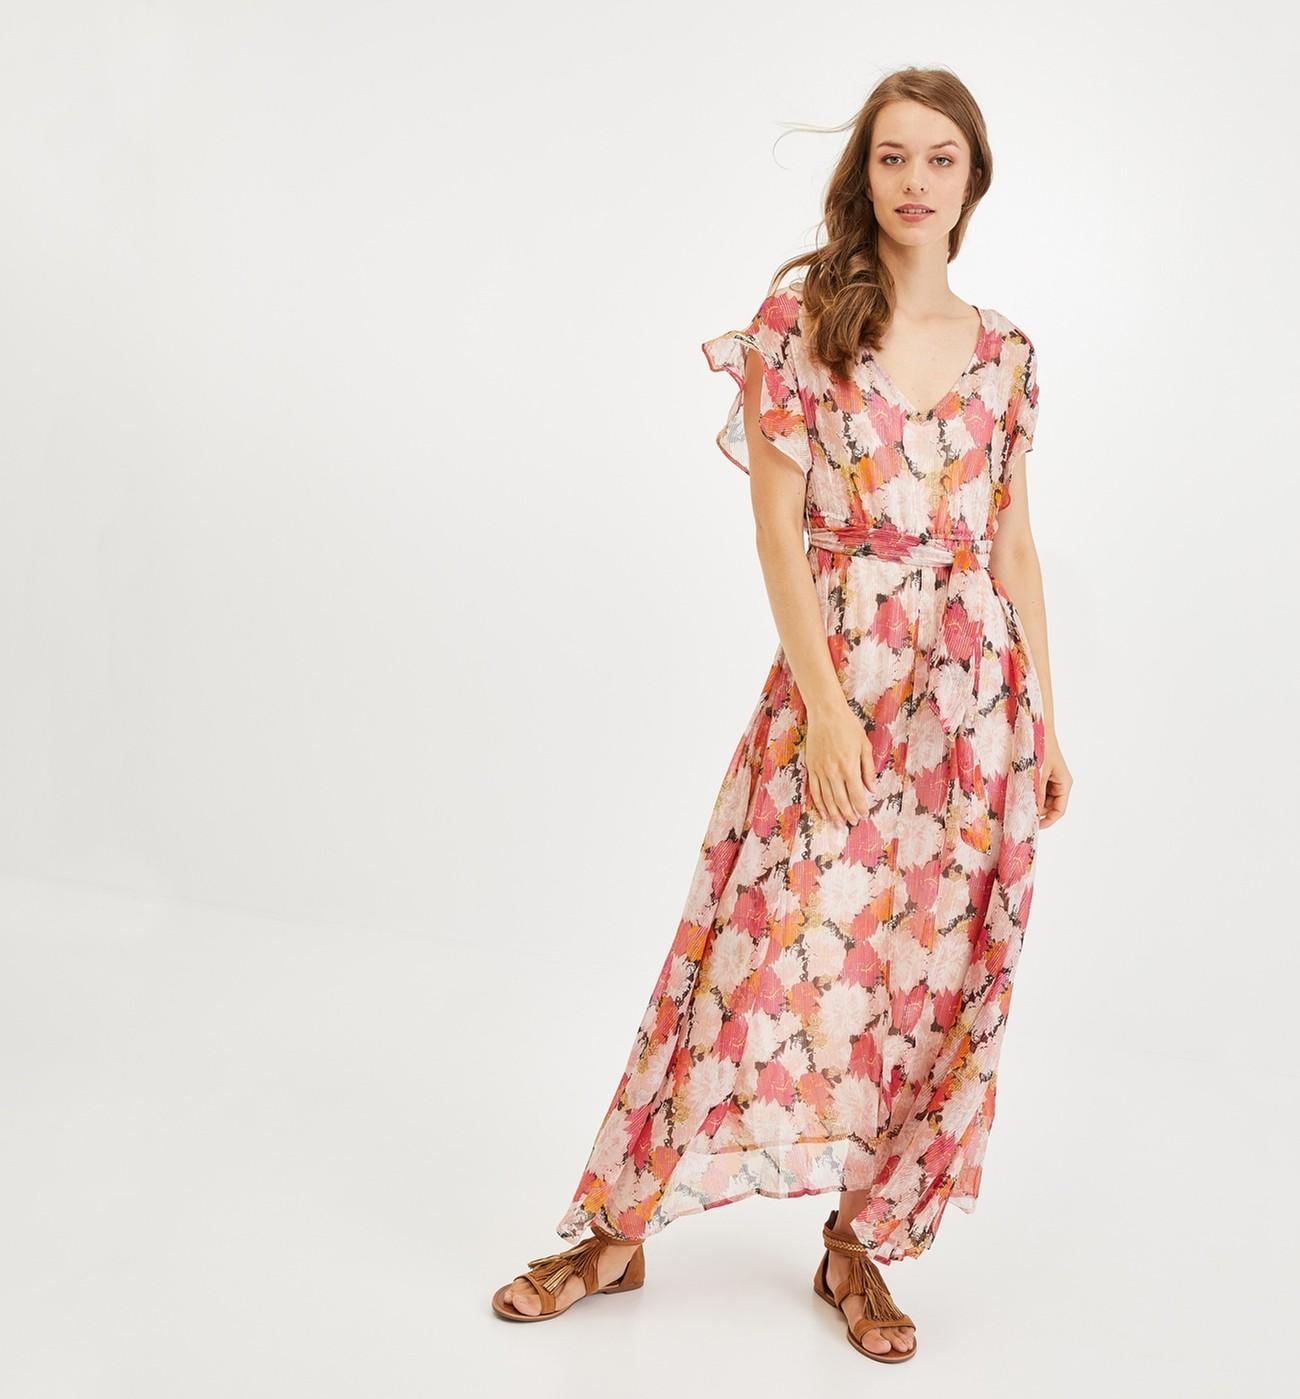 Femme Promod Robe Promod Robe En Voile Yf7ybv6g